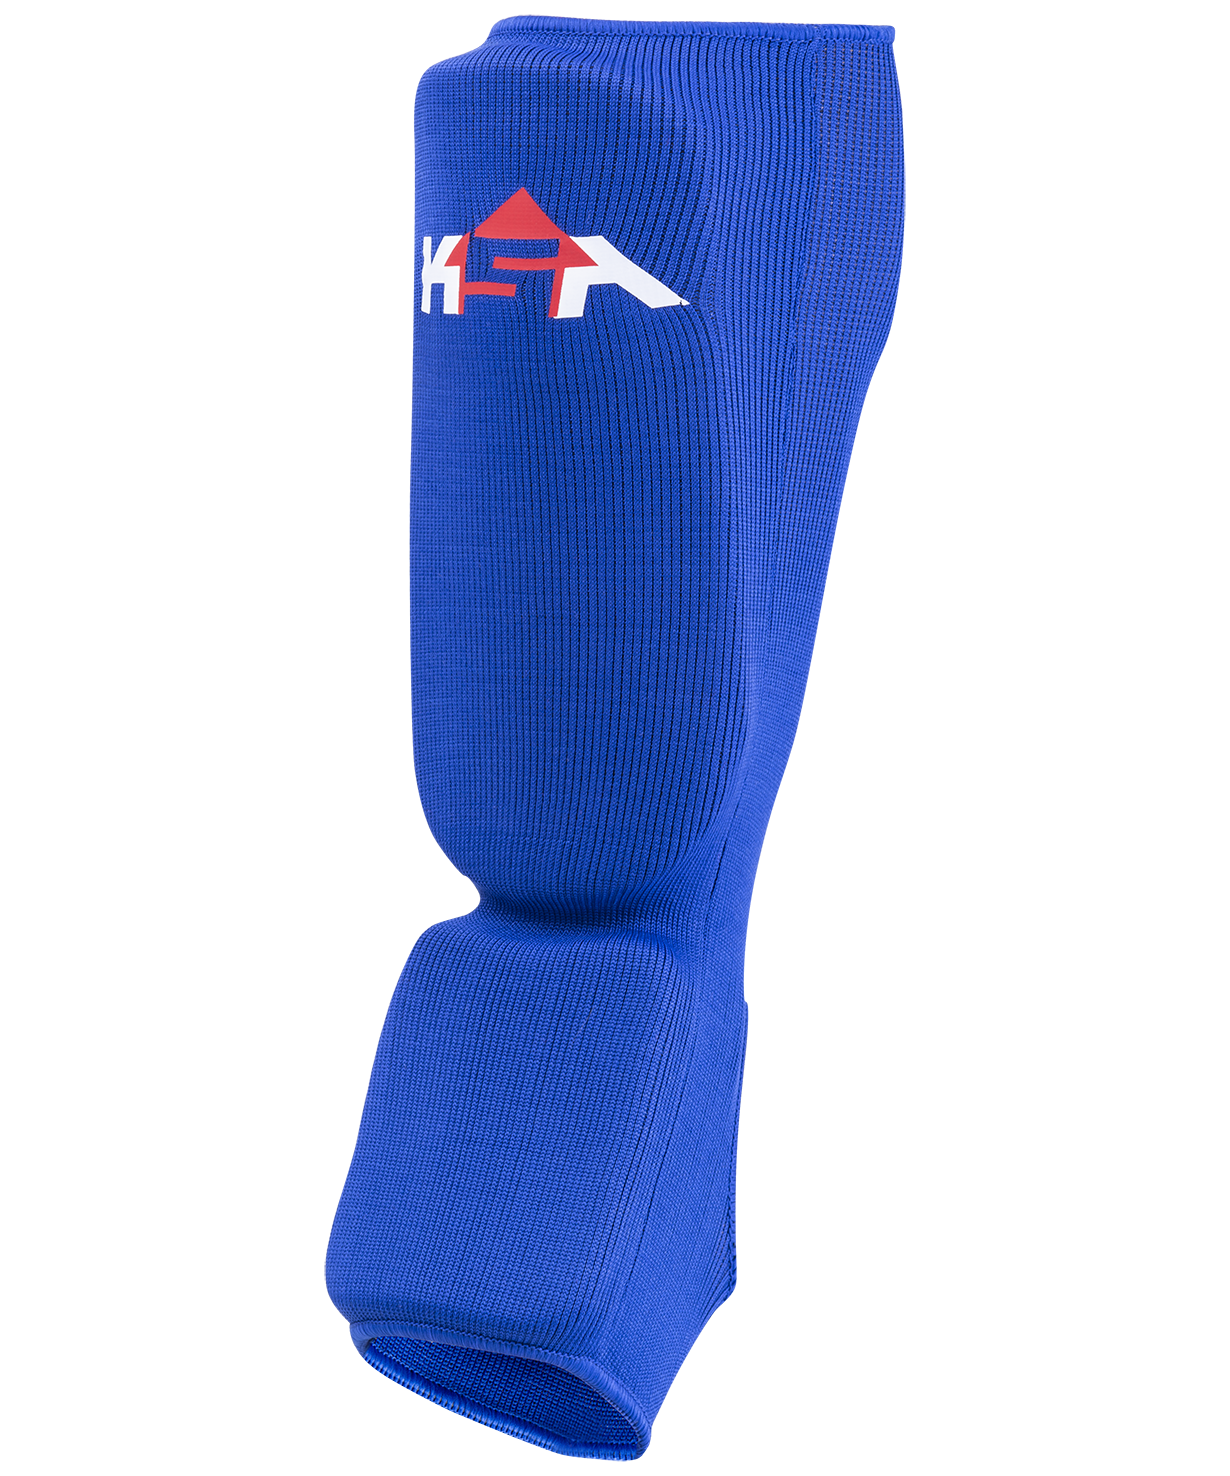 Другая защита Защита голень-стопа KSA синяя 774fca175e6b28542babc181106c5d63.png